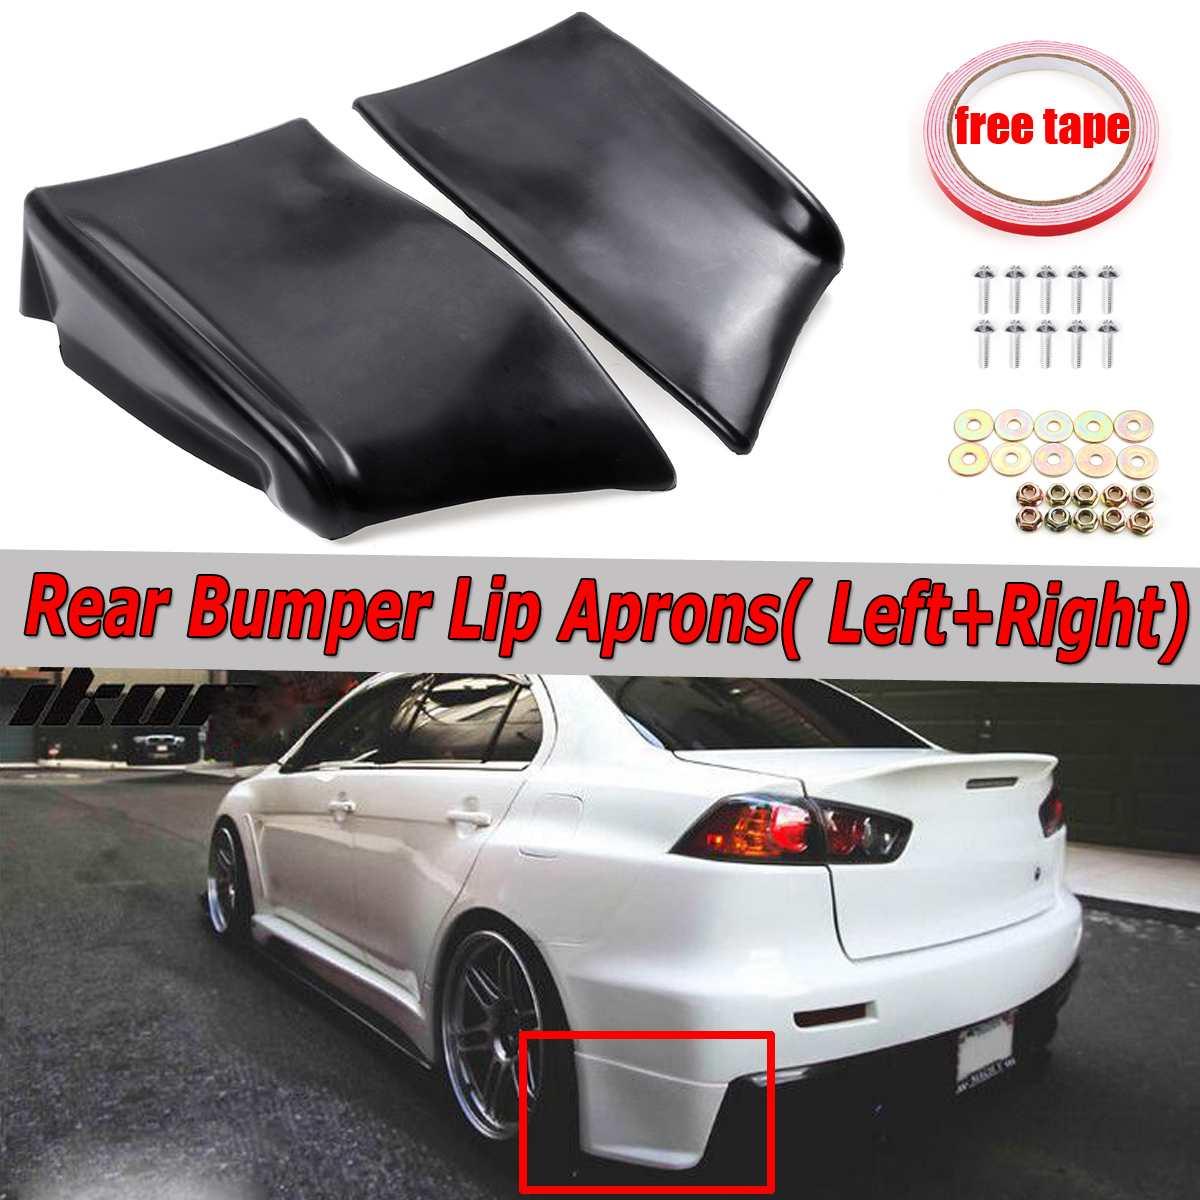 2pc car rear bumper lip spats aprons diffuser splitters protector for mitsubishi lancer evolution x evo